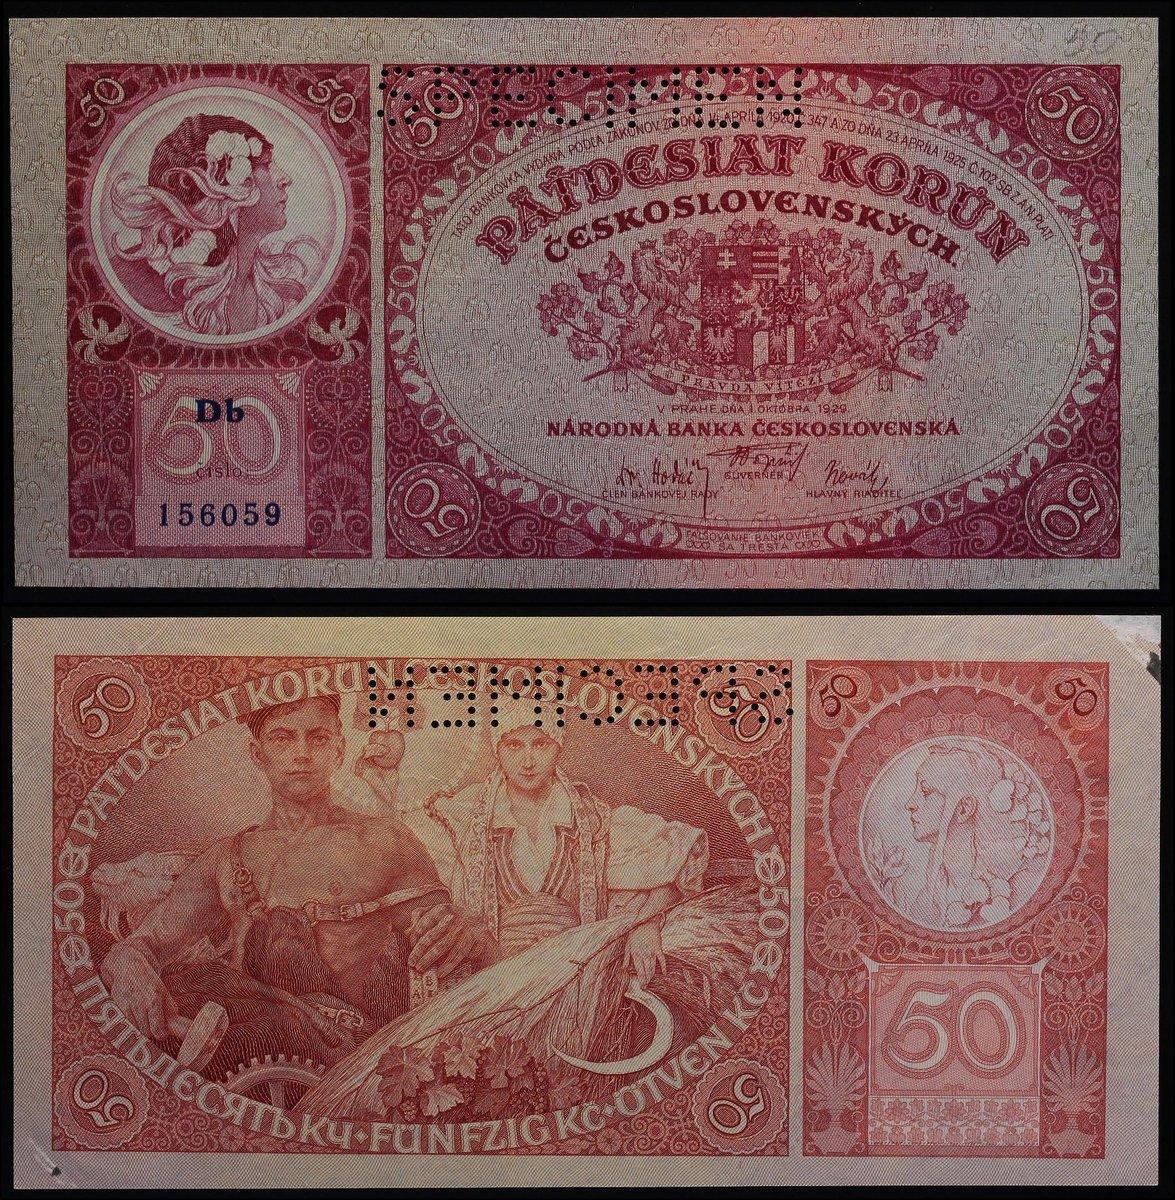 CZECHOSLOVAKIA 5000 5,000 KORUN 1920 STAMP P 16s SPECIMEN UNC